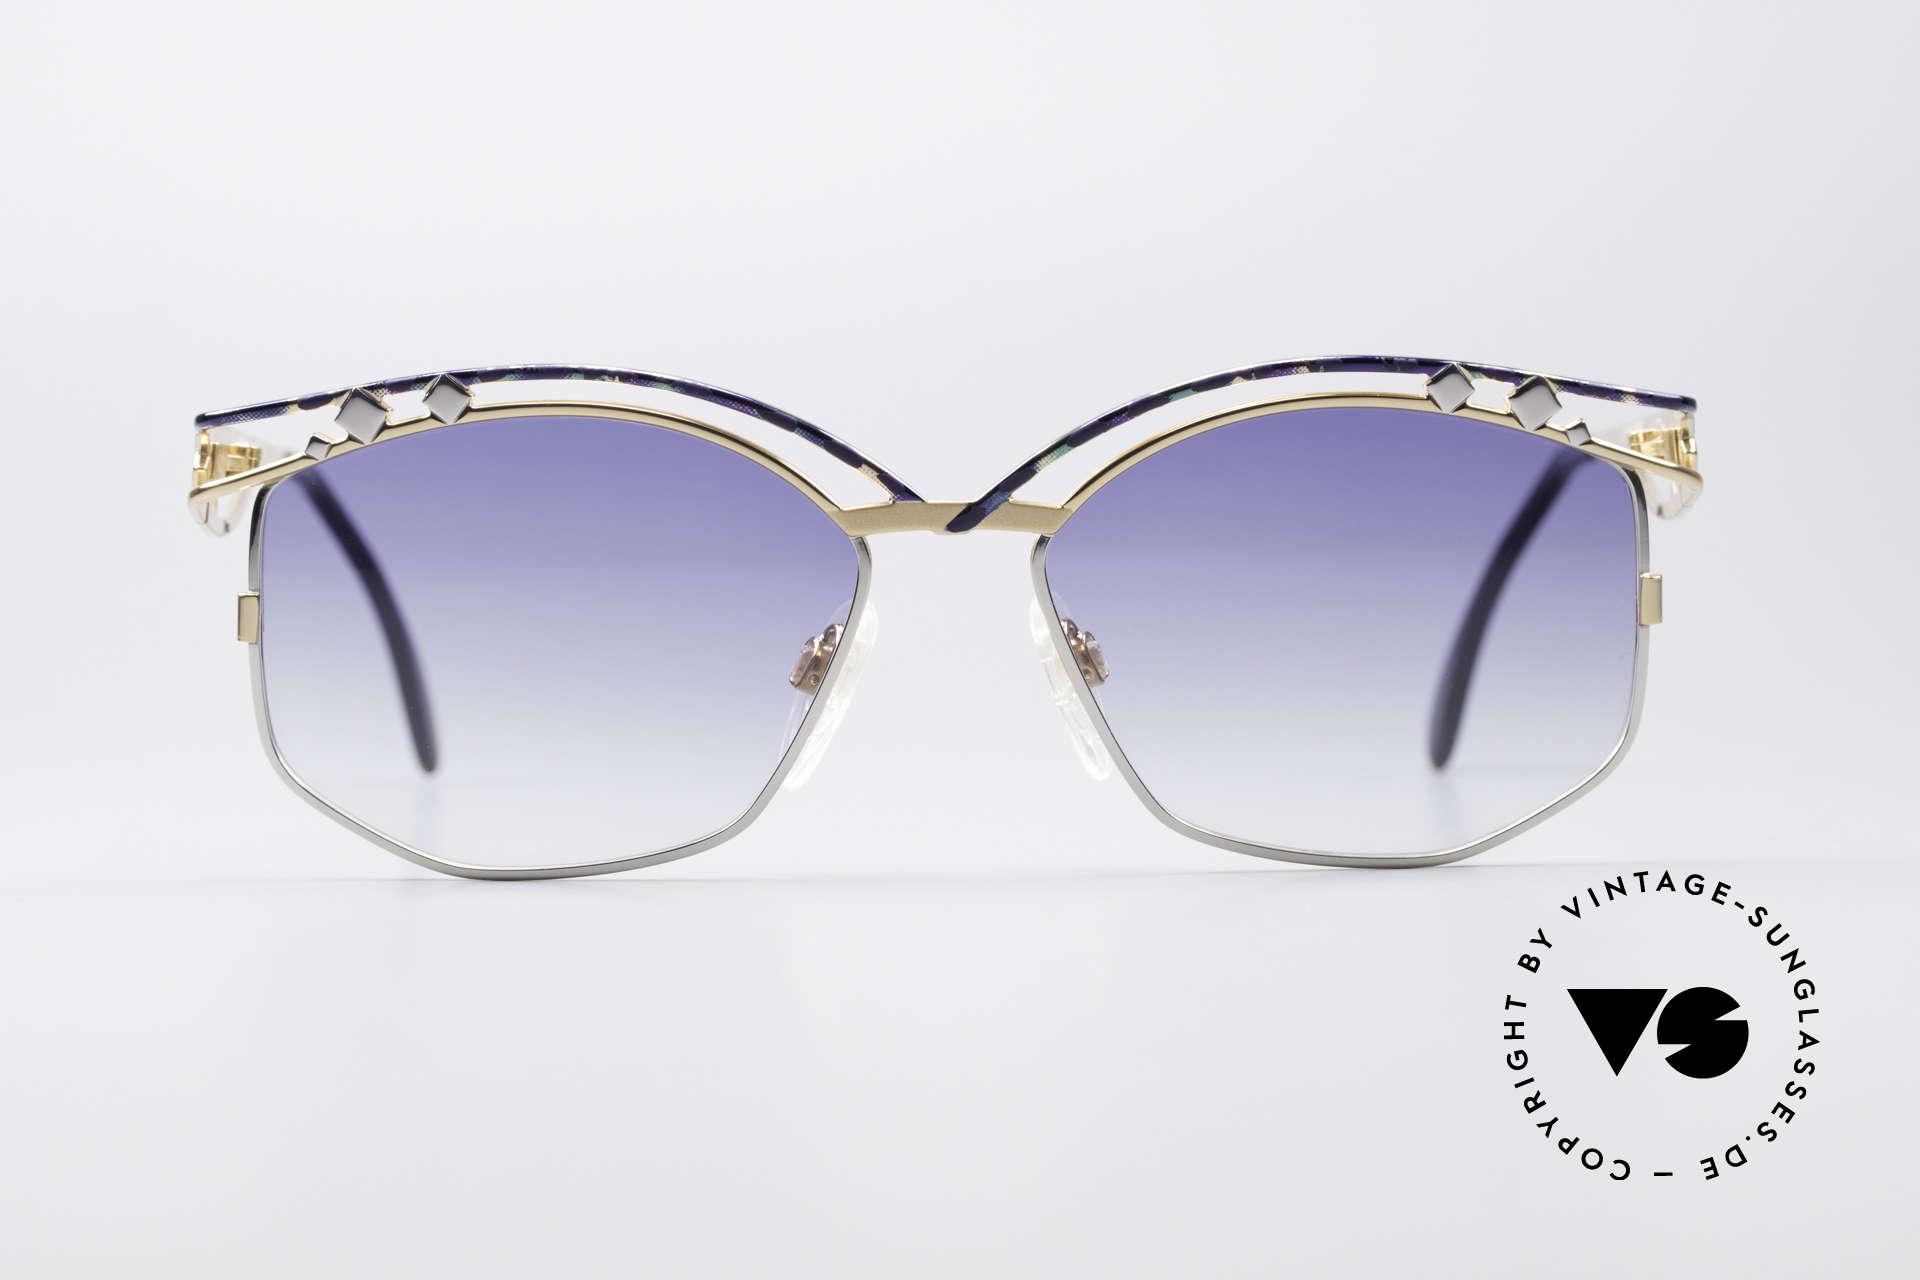 Cazal 280 True Vintage Ladies Sunglasses, distinctive creation by CAri ZALloni (Mr. CAZAL, RIP), Made for Women